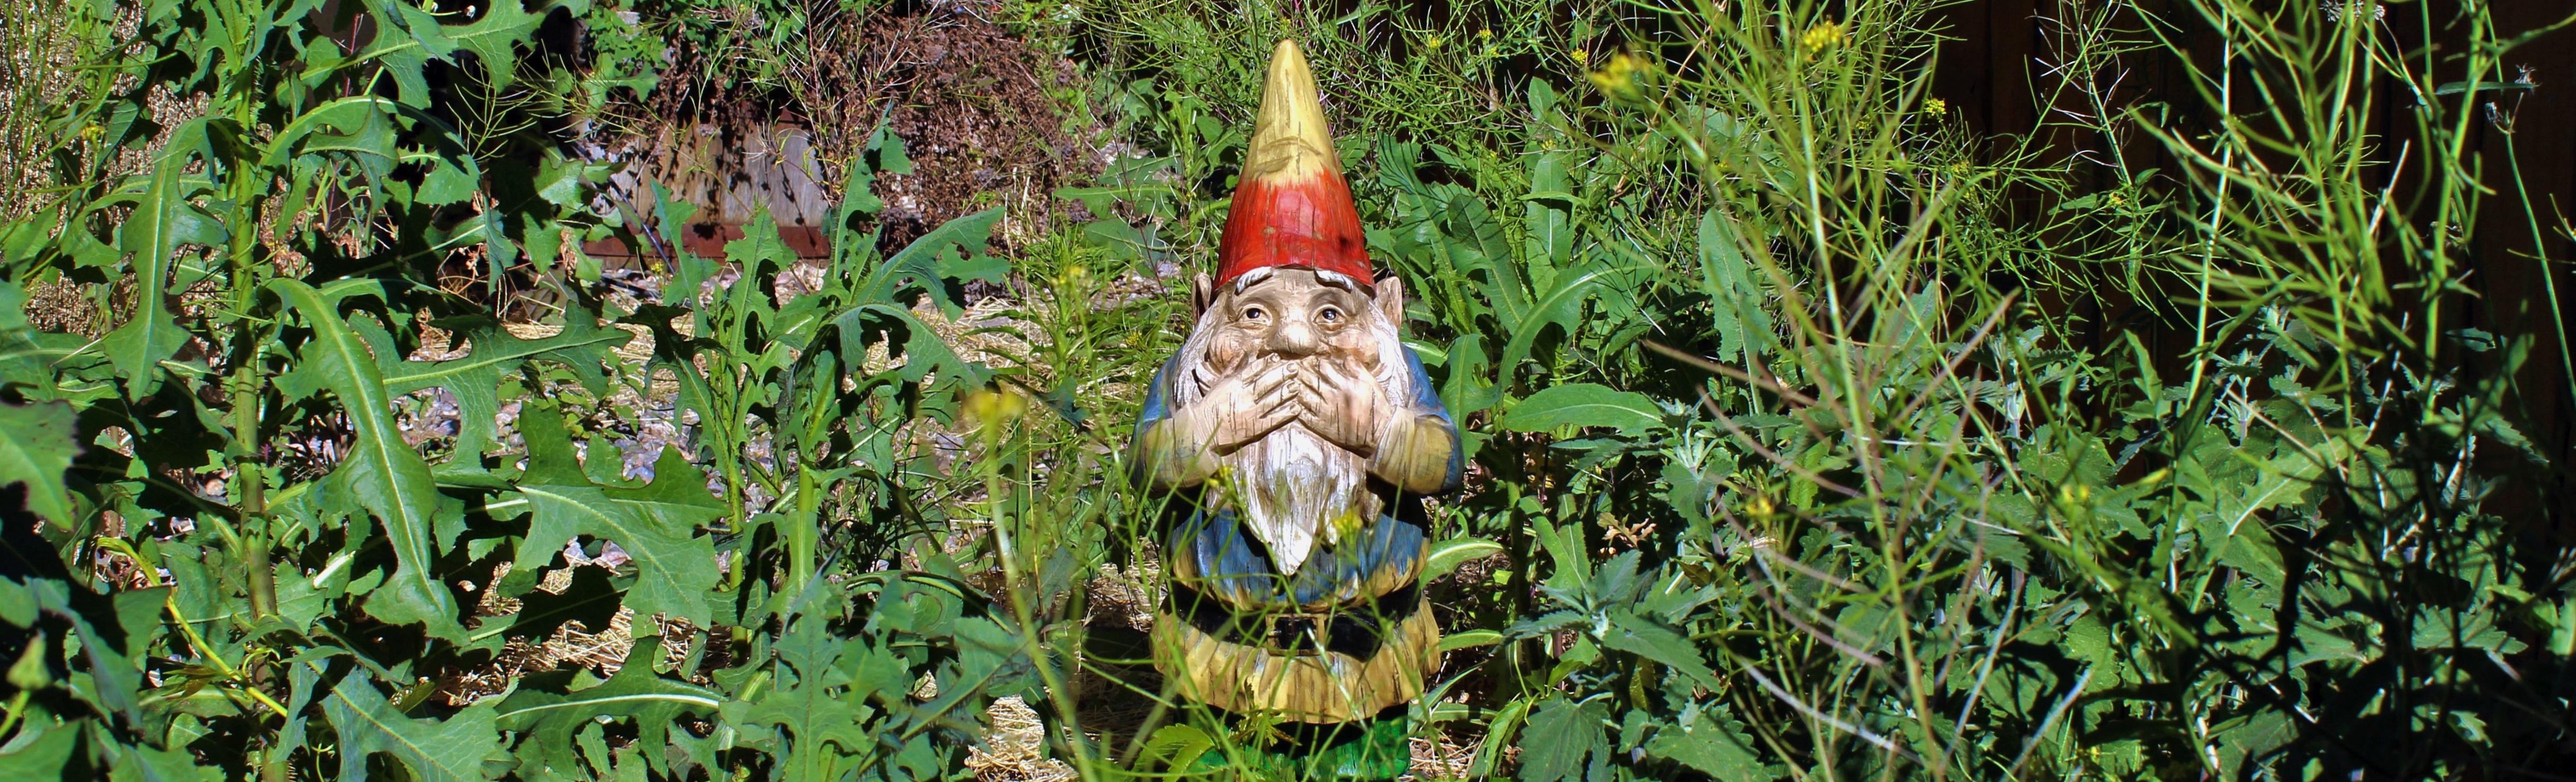 garden_gnome_cropped.jpeg